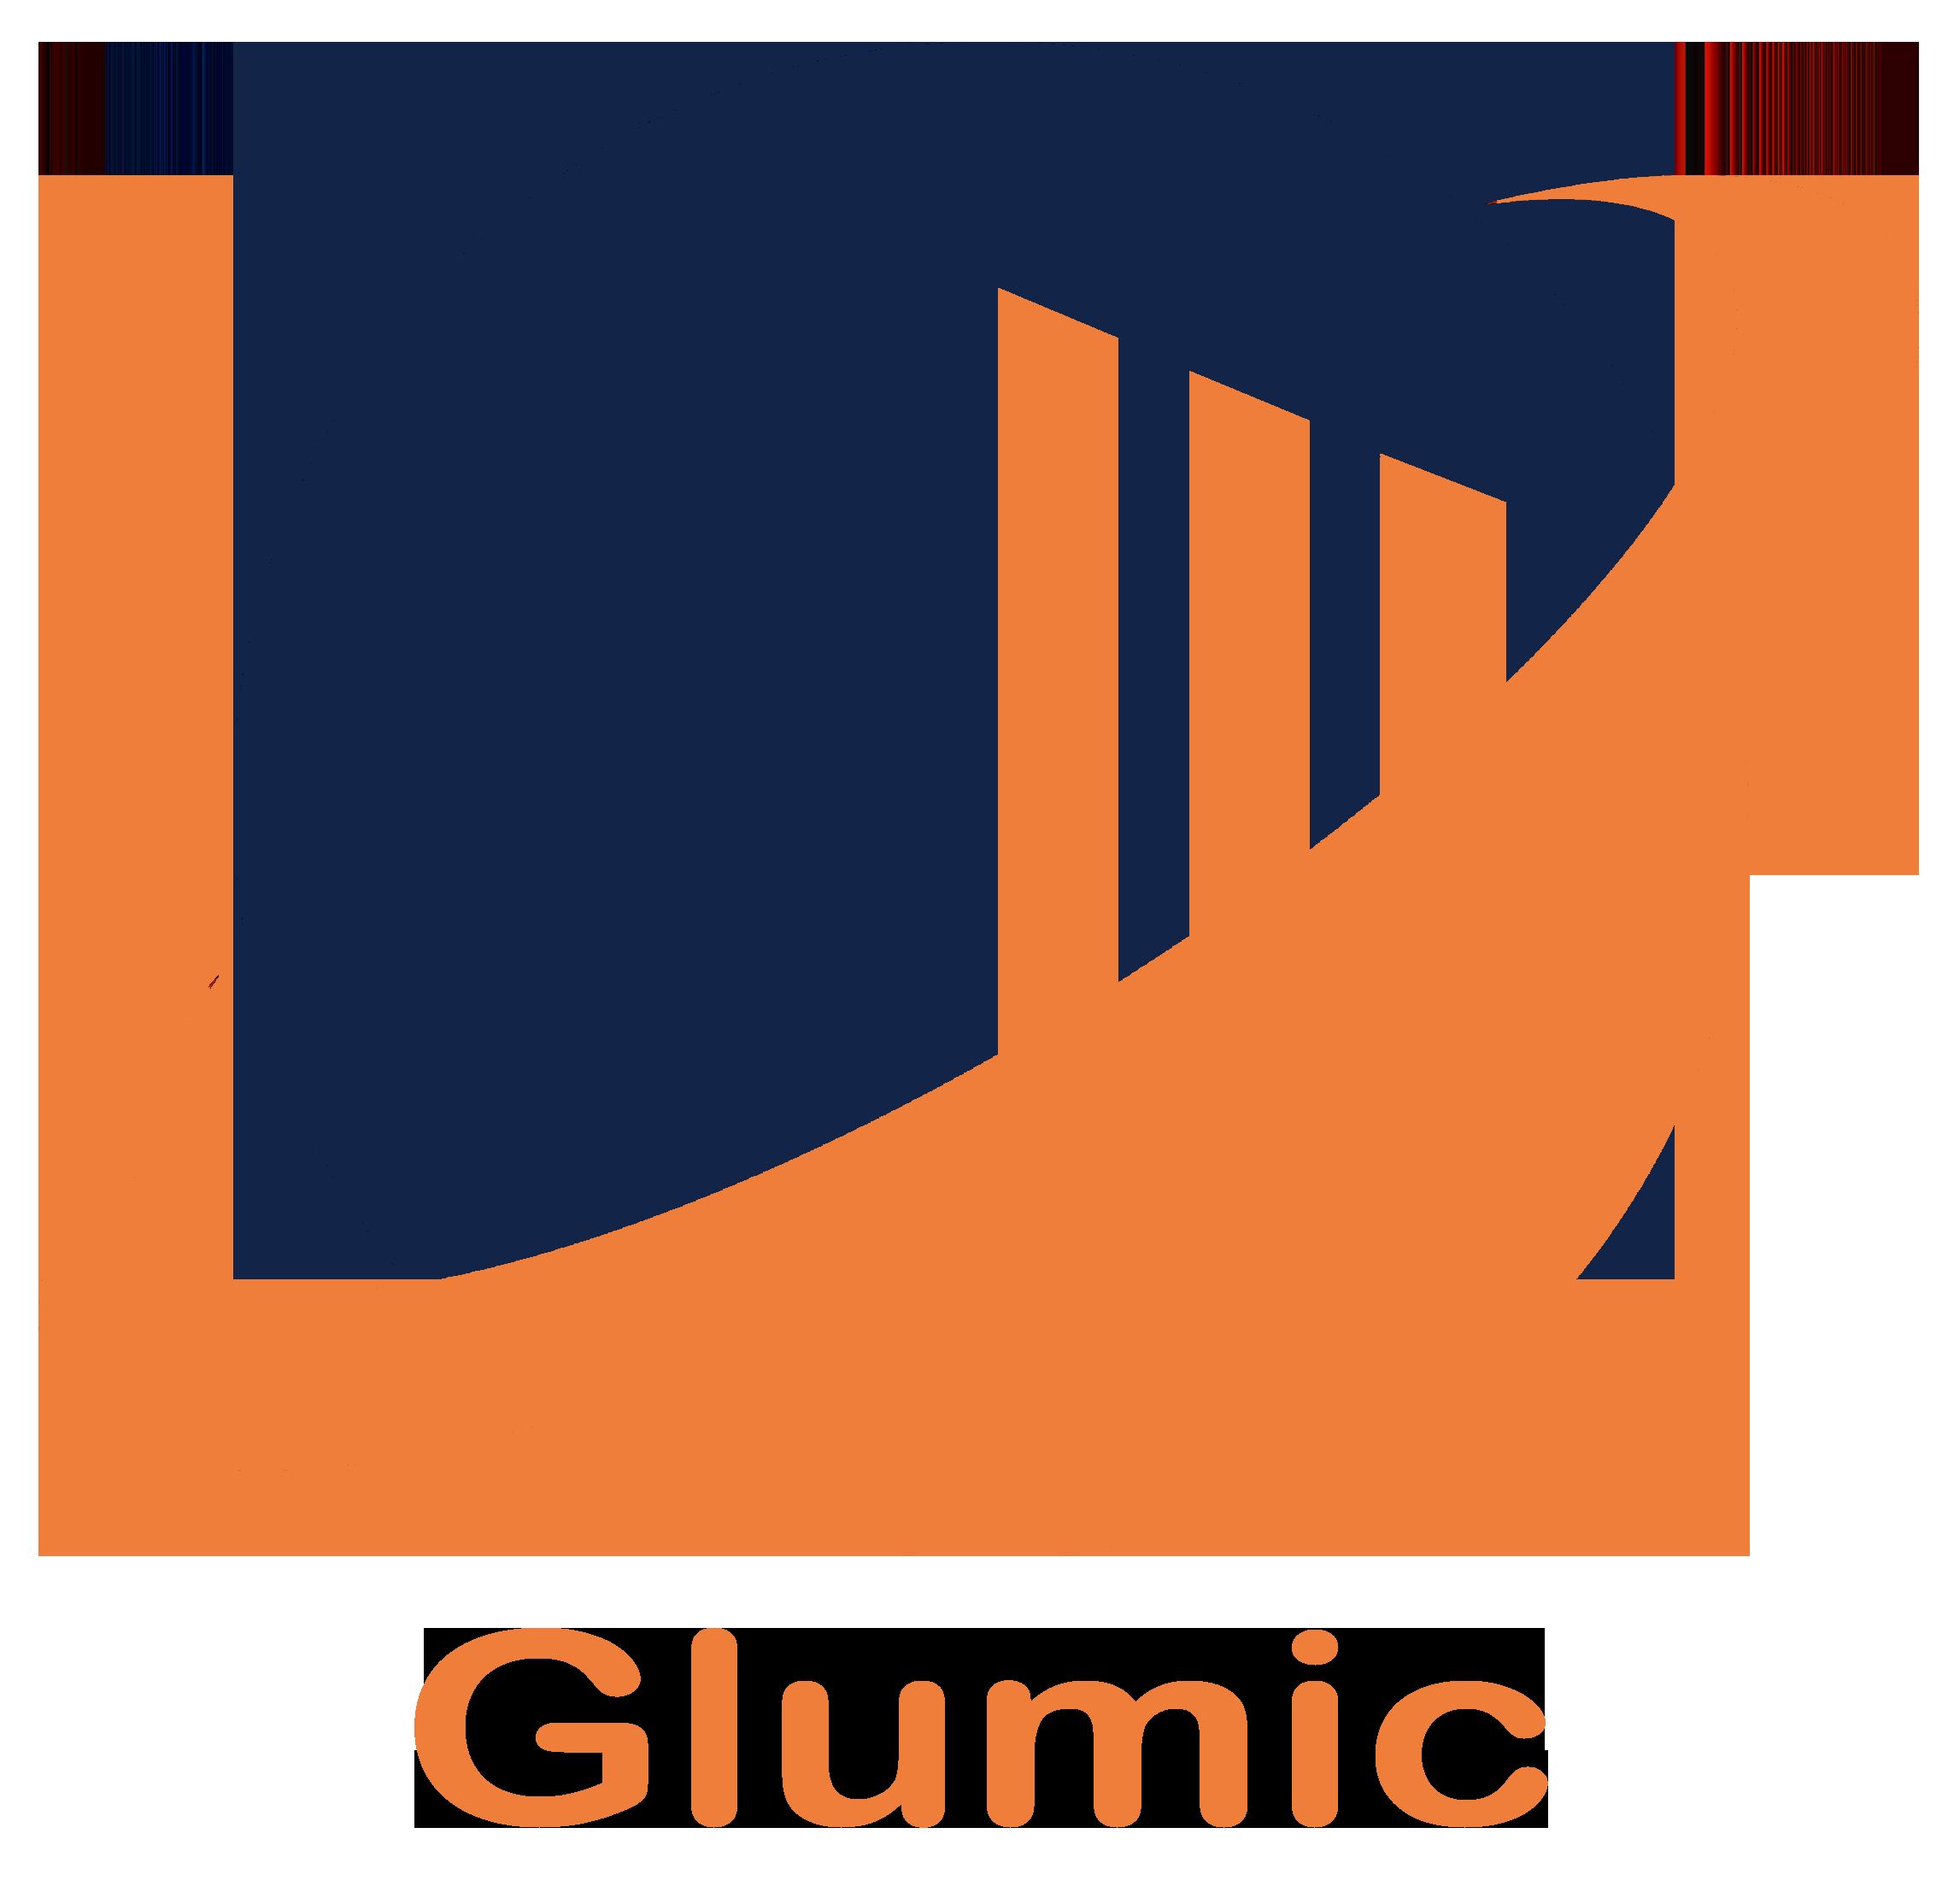 GLUMIC